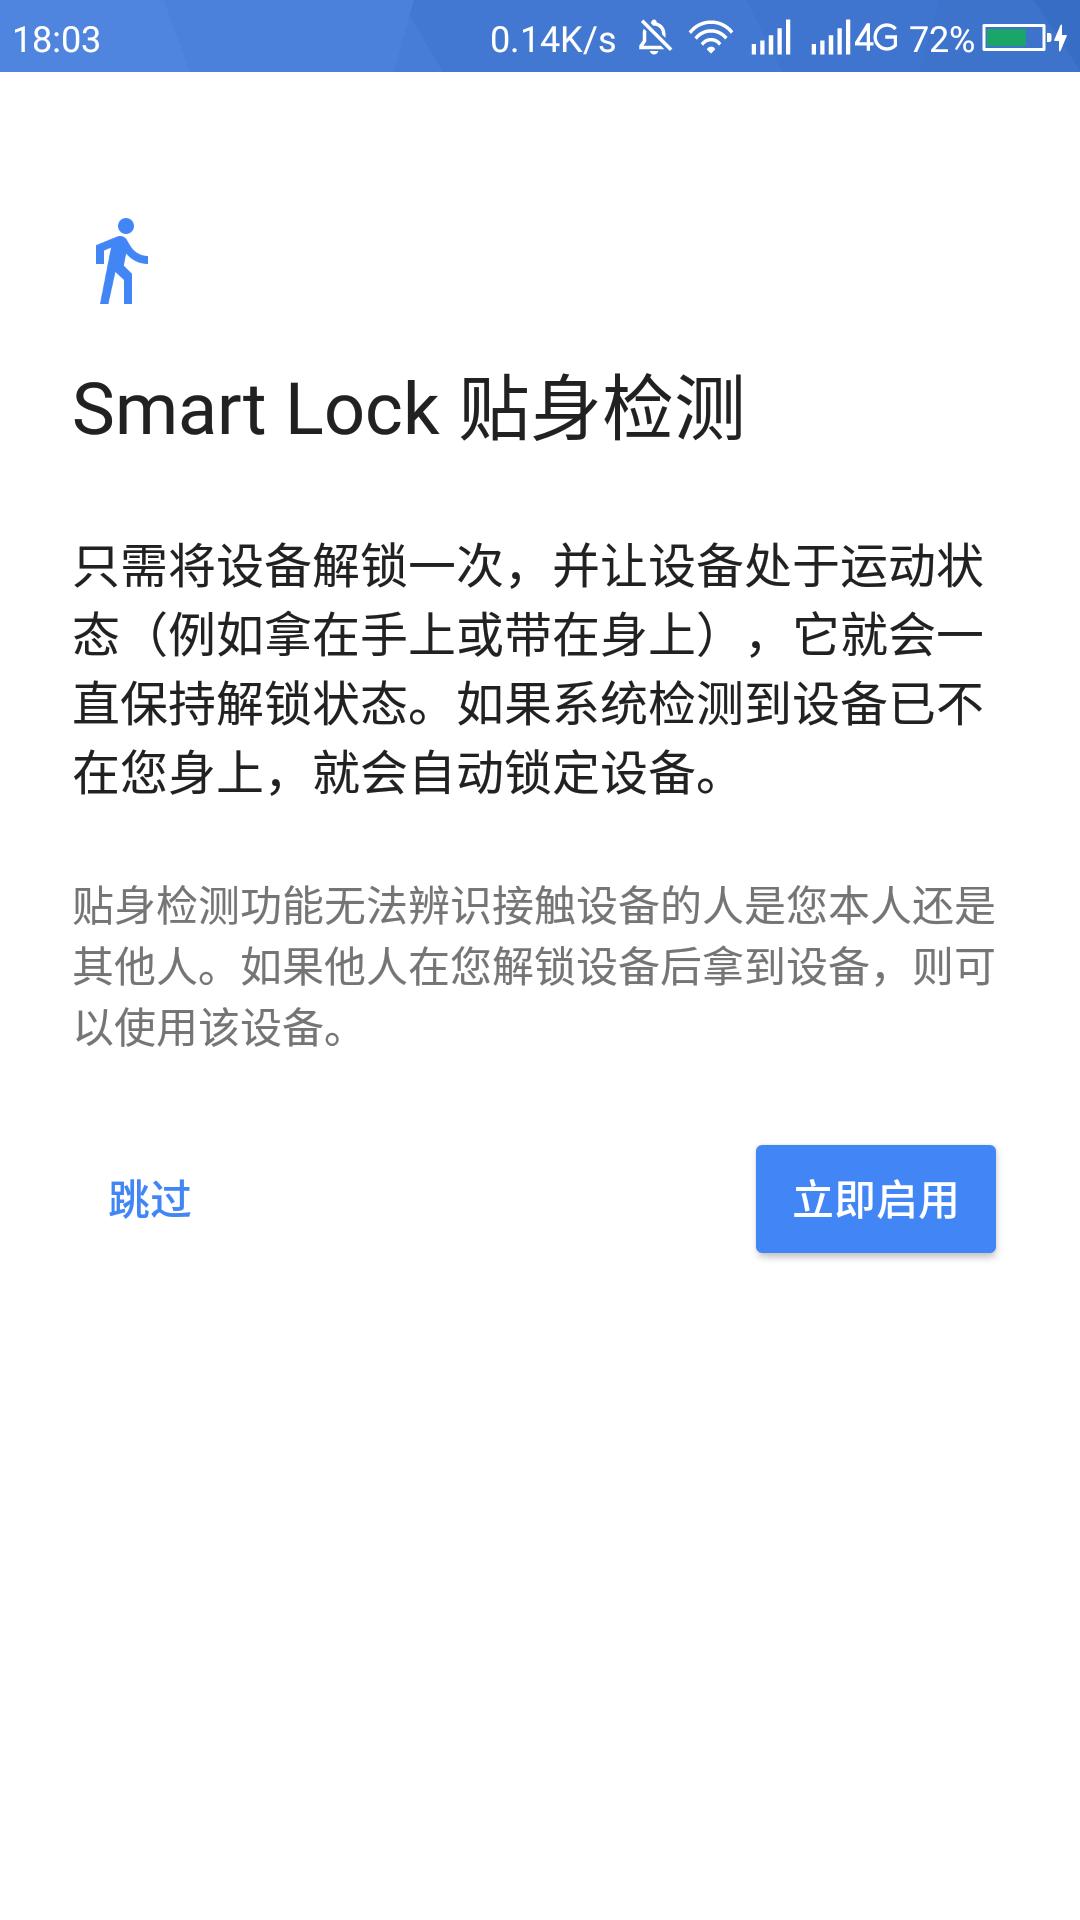 Screenshot_2017-11-01-18-04-01.png